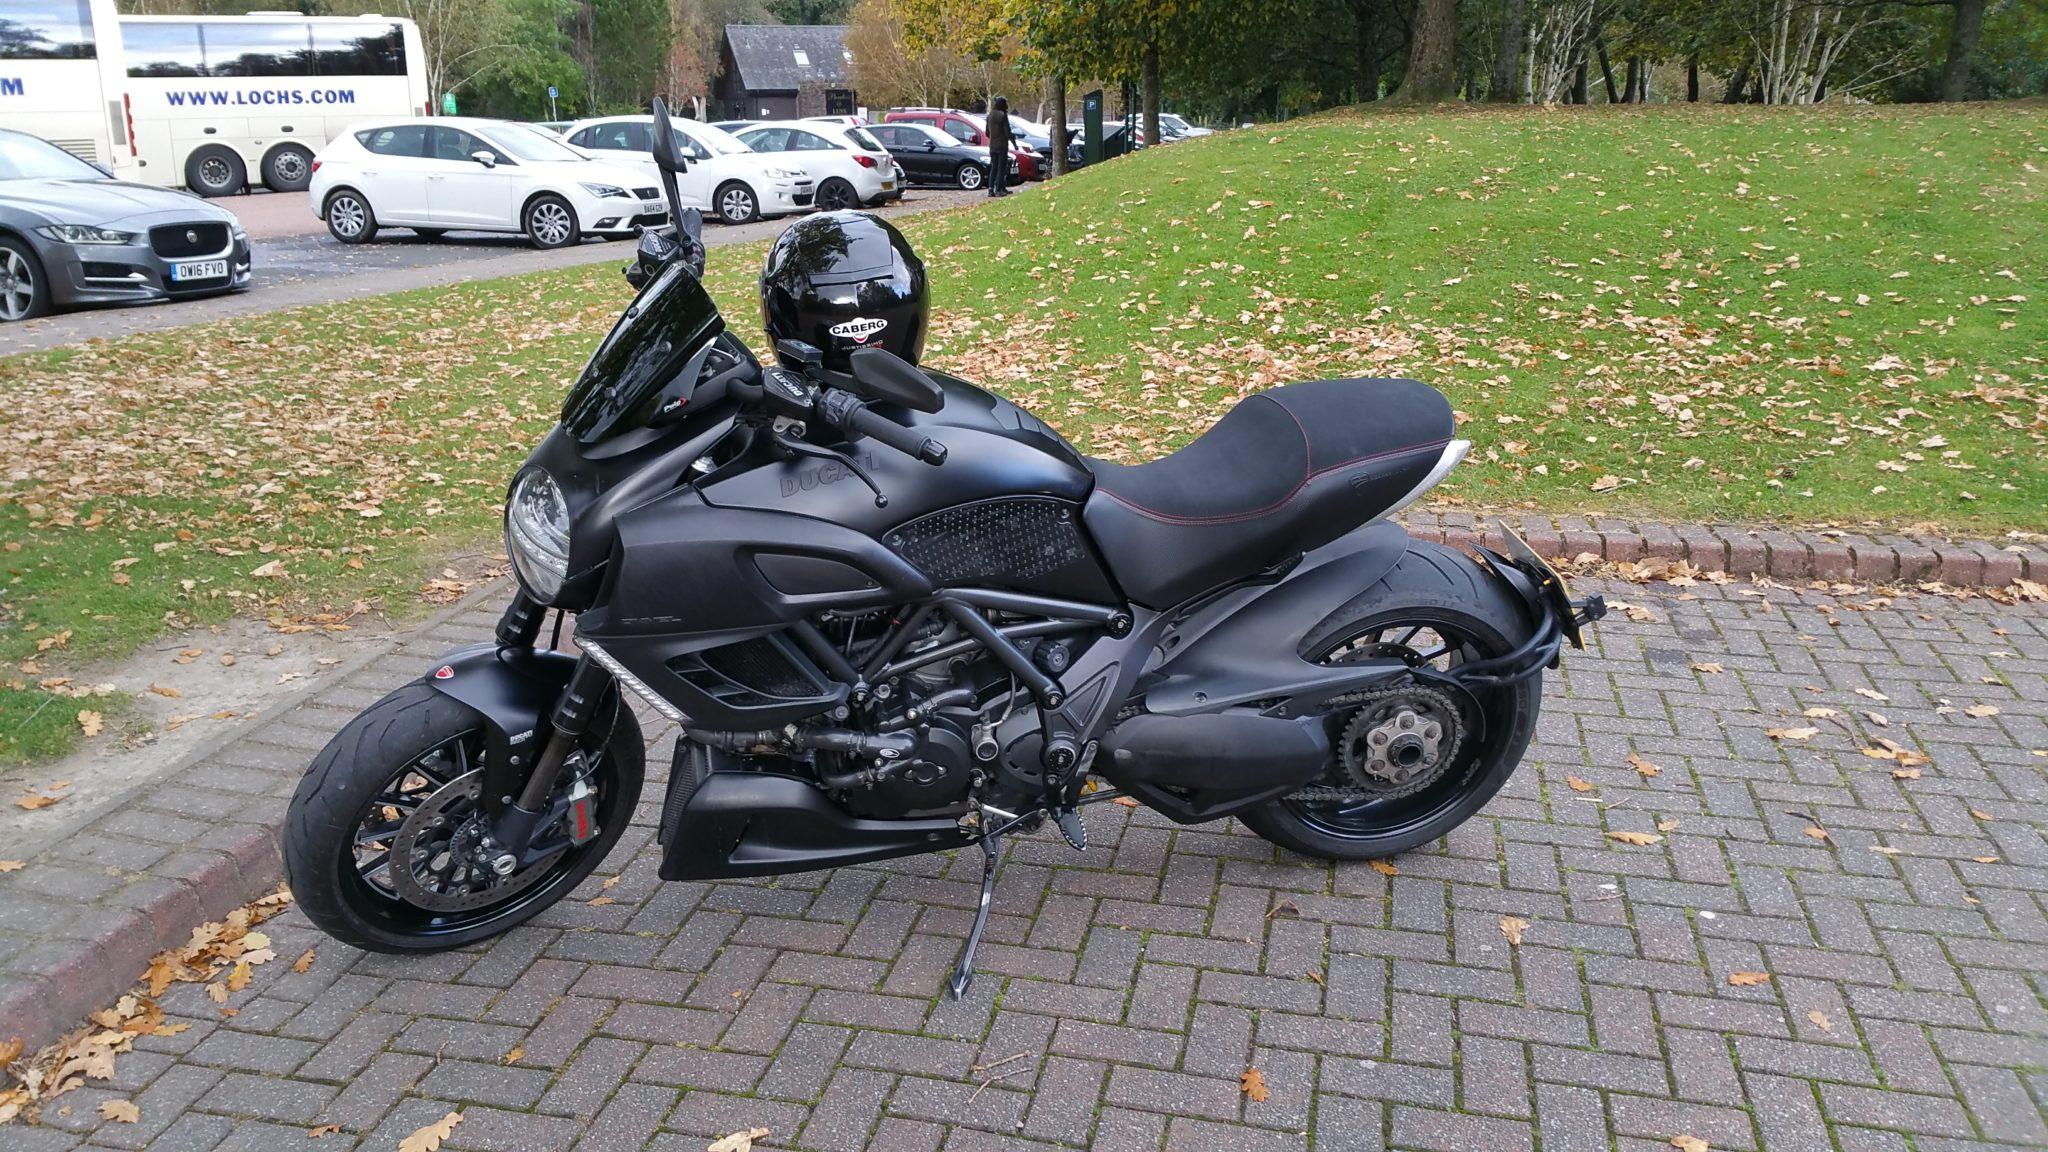 Dennis McLaughlin – Ducati Diavel